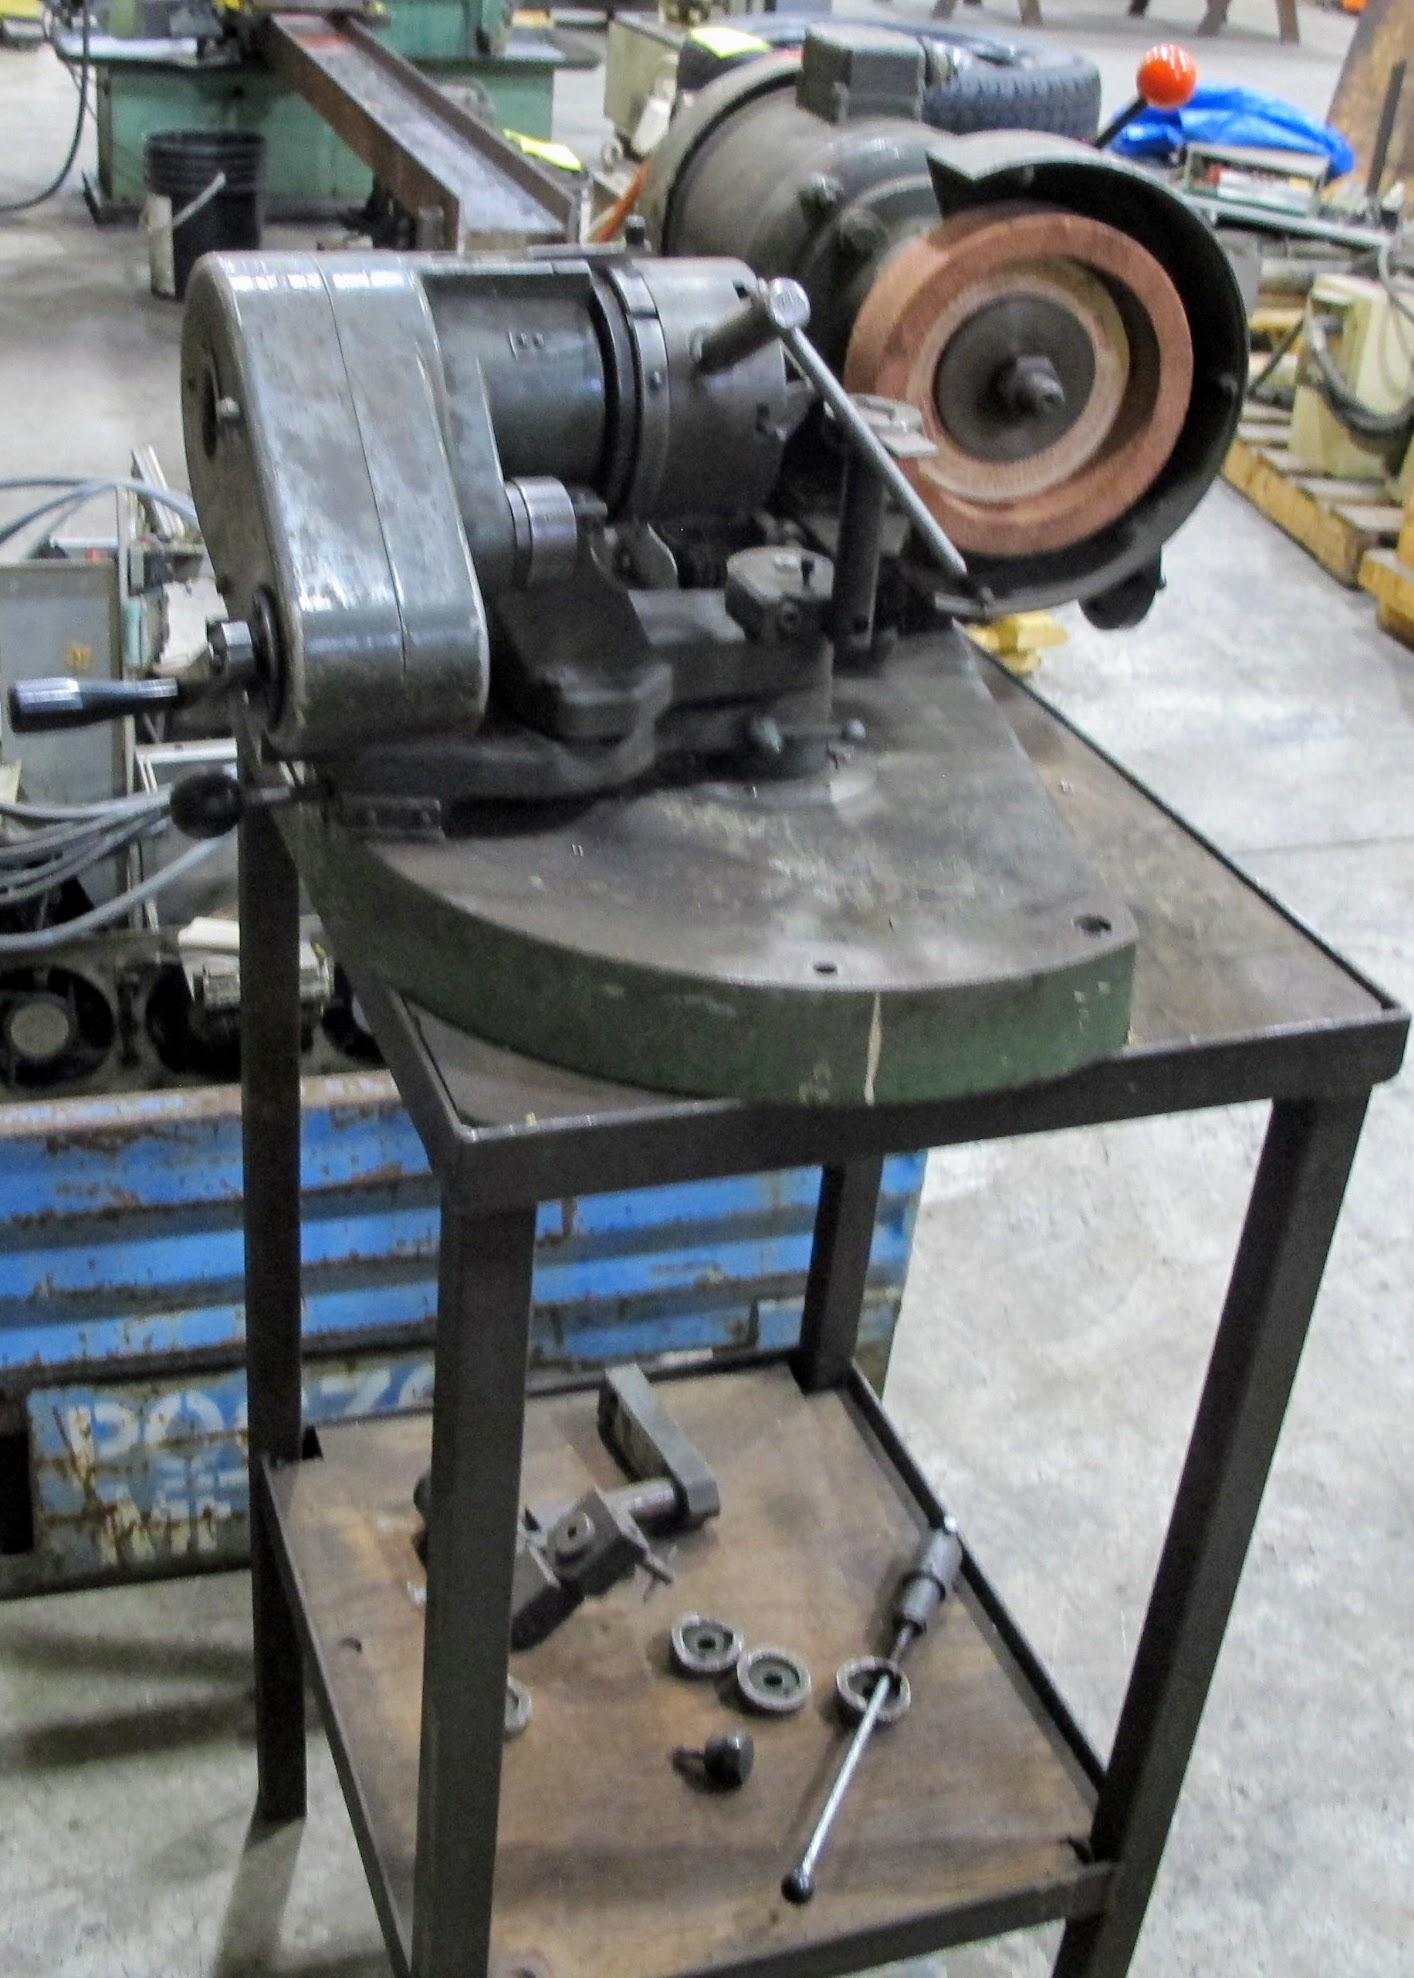 GRYPHON TOOL GRINDER, MODEL 58, S/N 74592L - Image 3 of 3